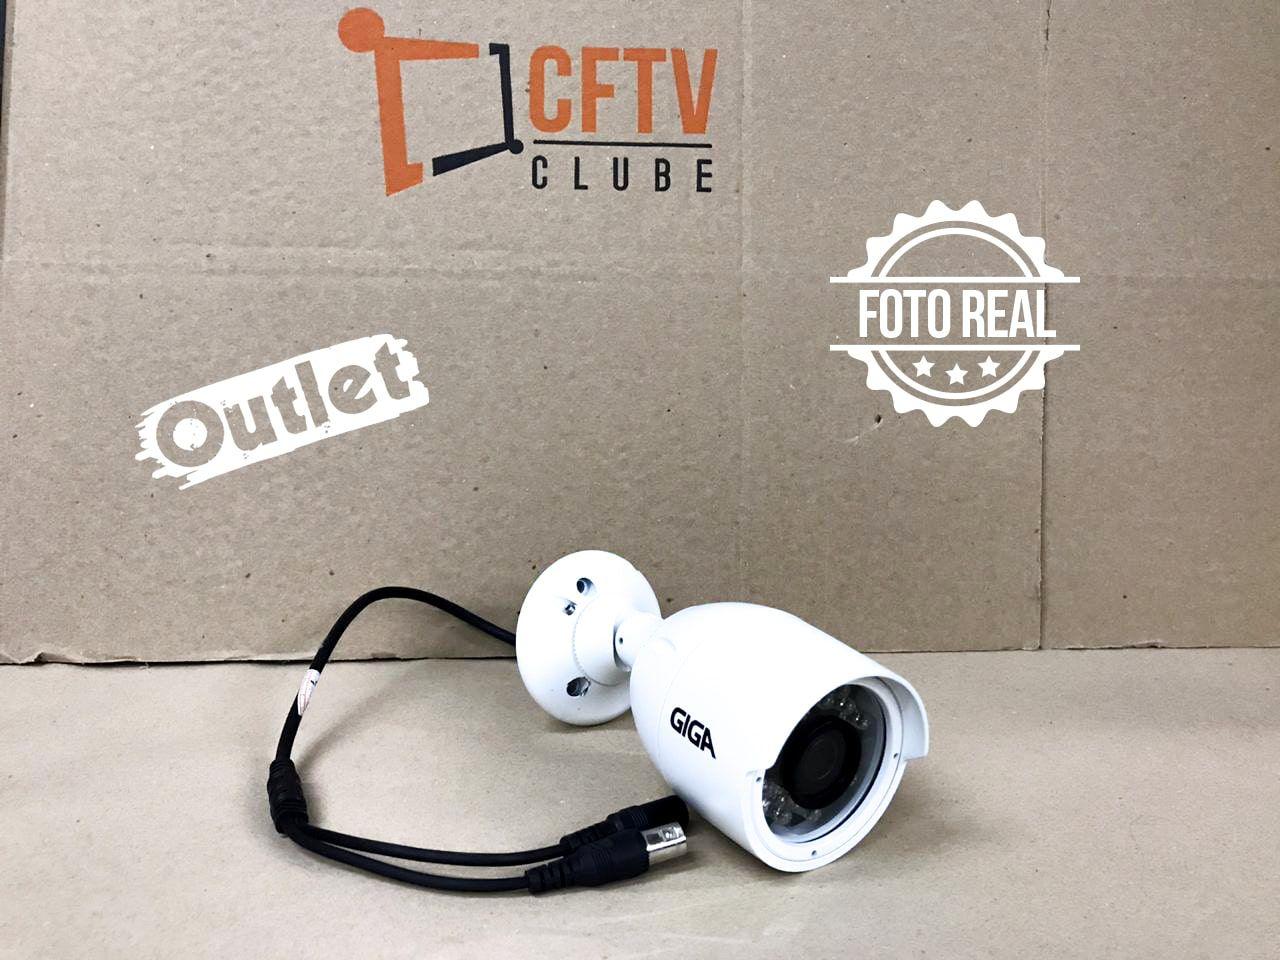 Outlet - Câmera Giga GS0016 Bullet Open HD Plus IR 30M IP66 (1.0MP | 720p | 2.6mm | Metal)  - CFTV Clube | Brasil